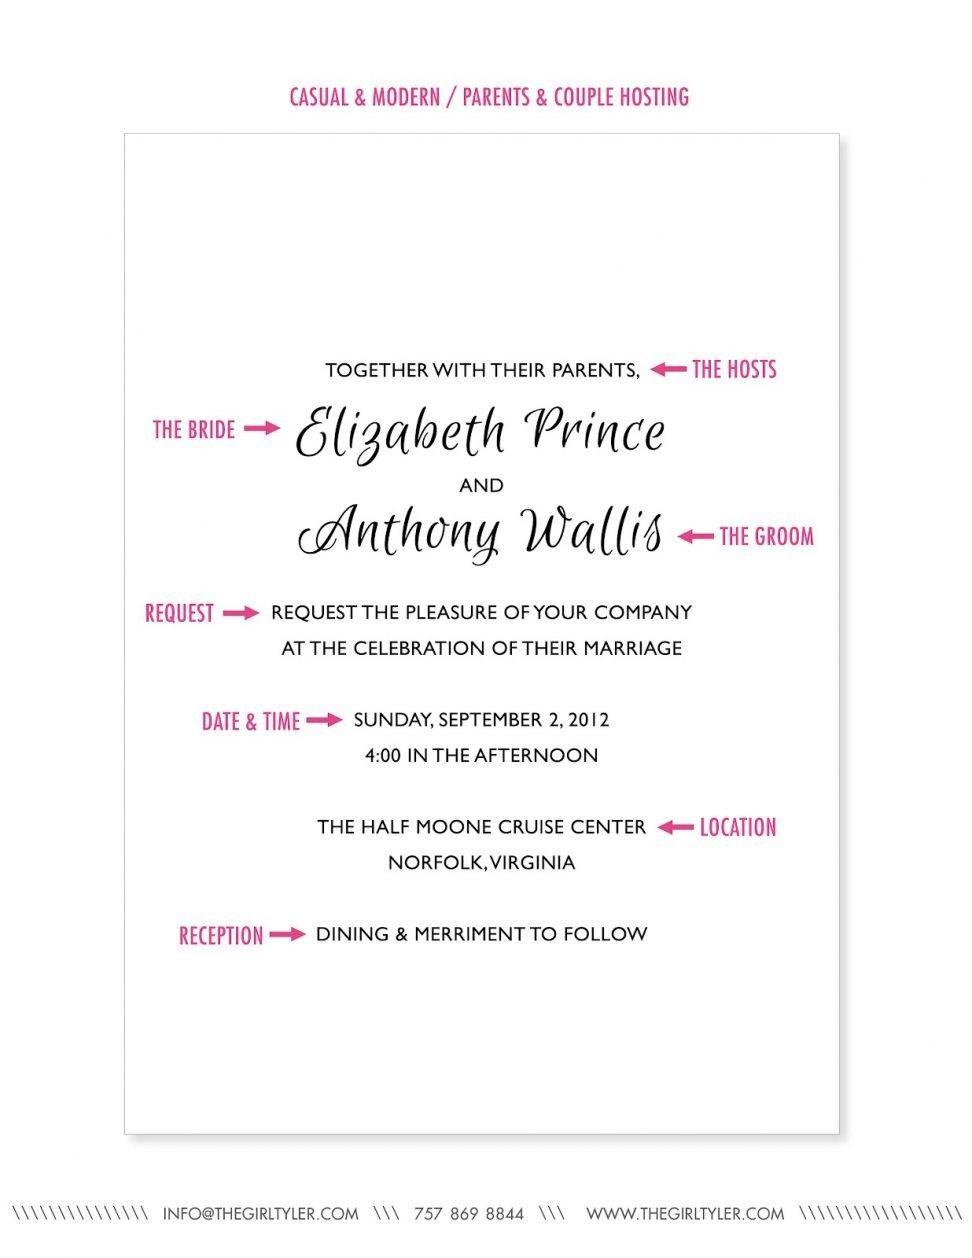 25 Amazing Picture Of Wedding Invitation Wording Etiquette Wedding Invitation Wording Casual Proper Wedding Invitation Wording Casual Wedding Invitations